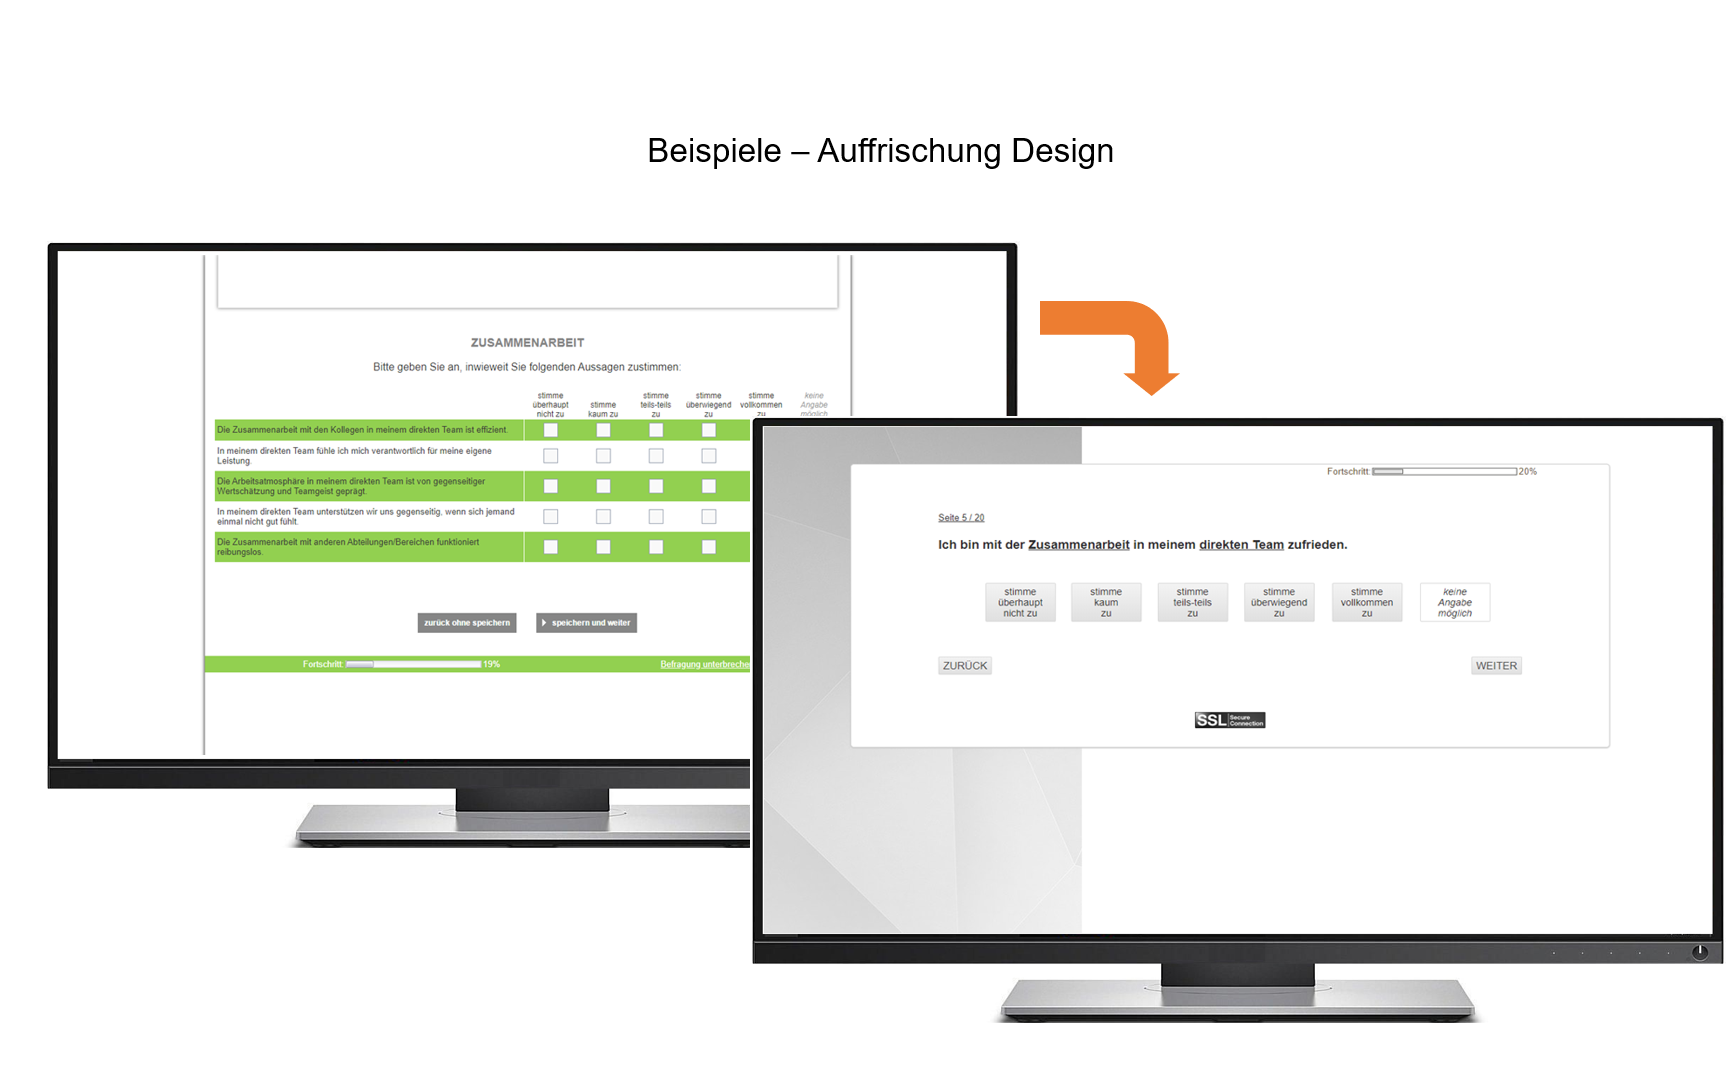 Screenshot mit zwei PCs Projekt TÜV Auffrischung Design